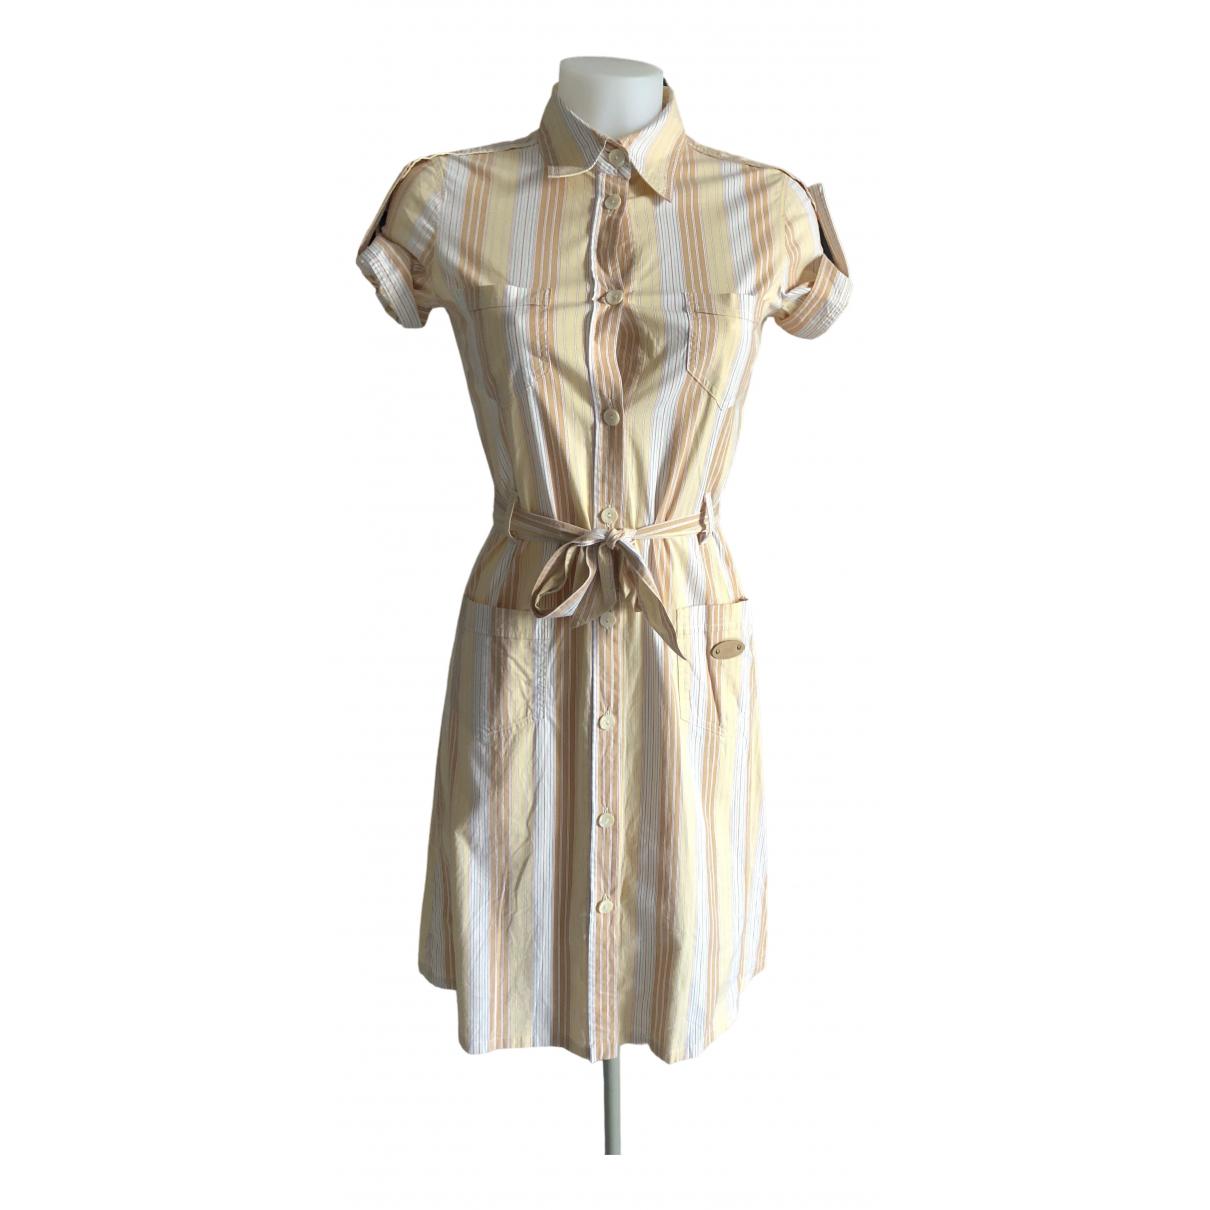 D&g \N Multicolour Cotton - elasthane dress for Women 40 IT